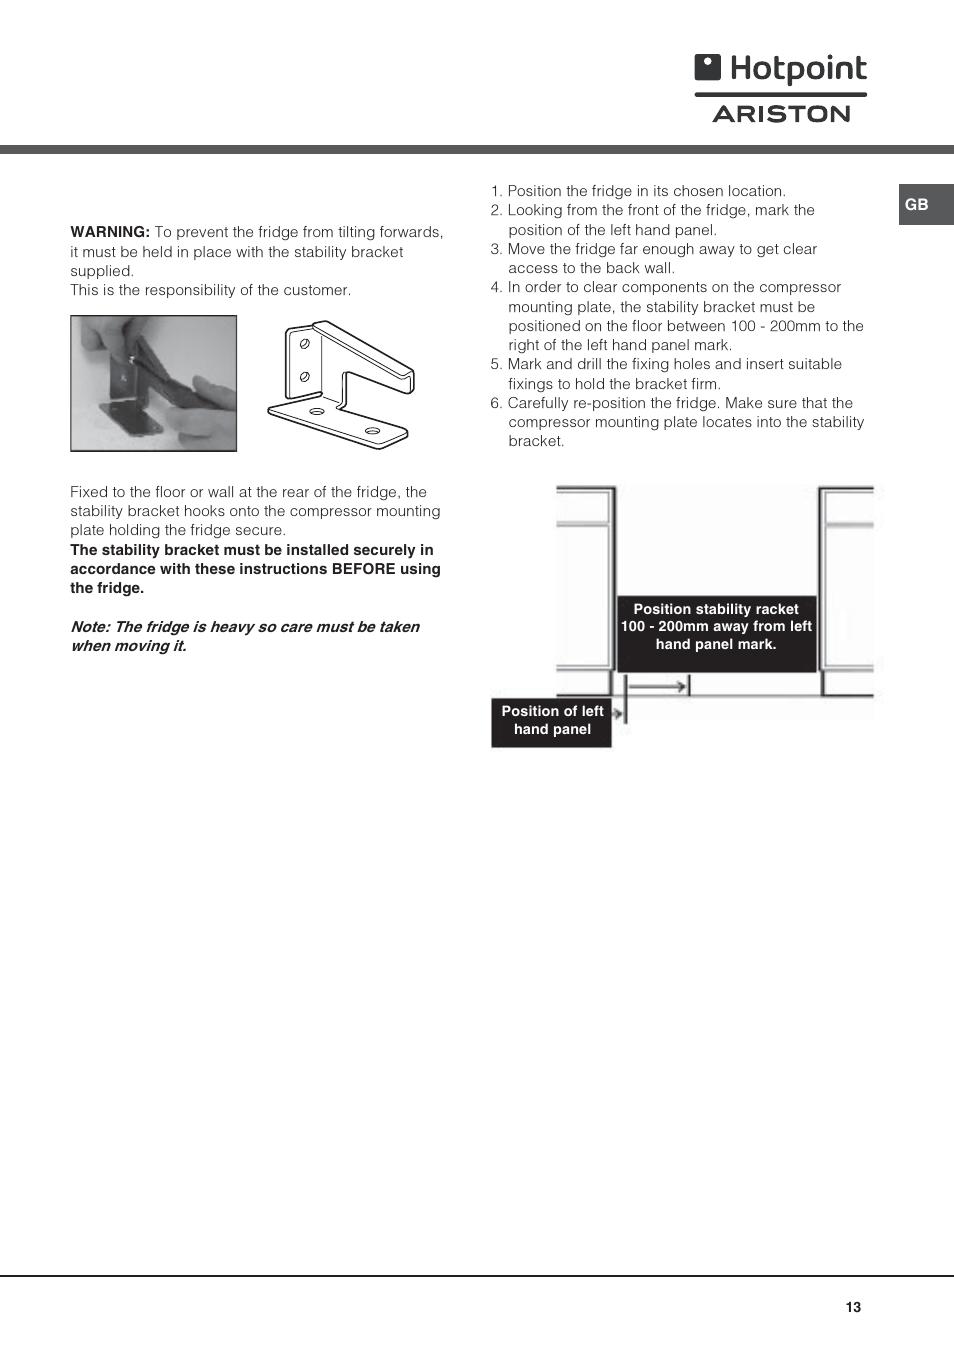 Hotpoint Ariston Monoporte SDS 1721 V-HA User Manual